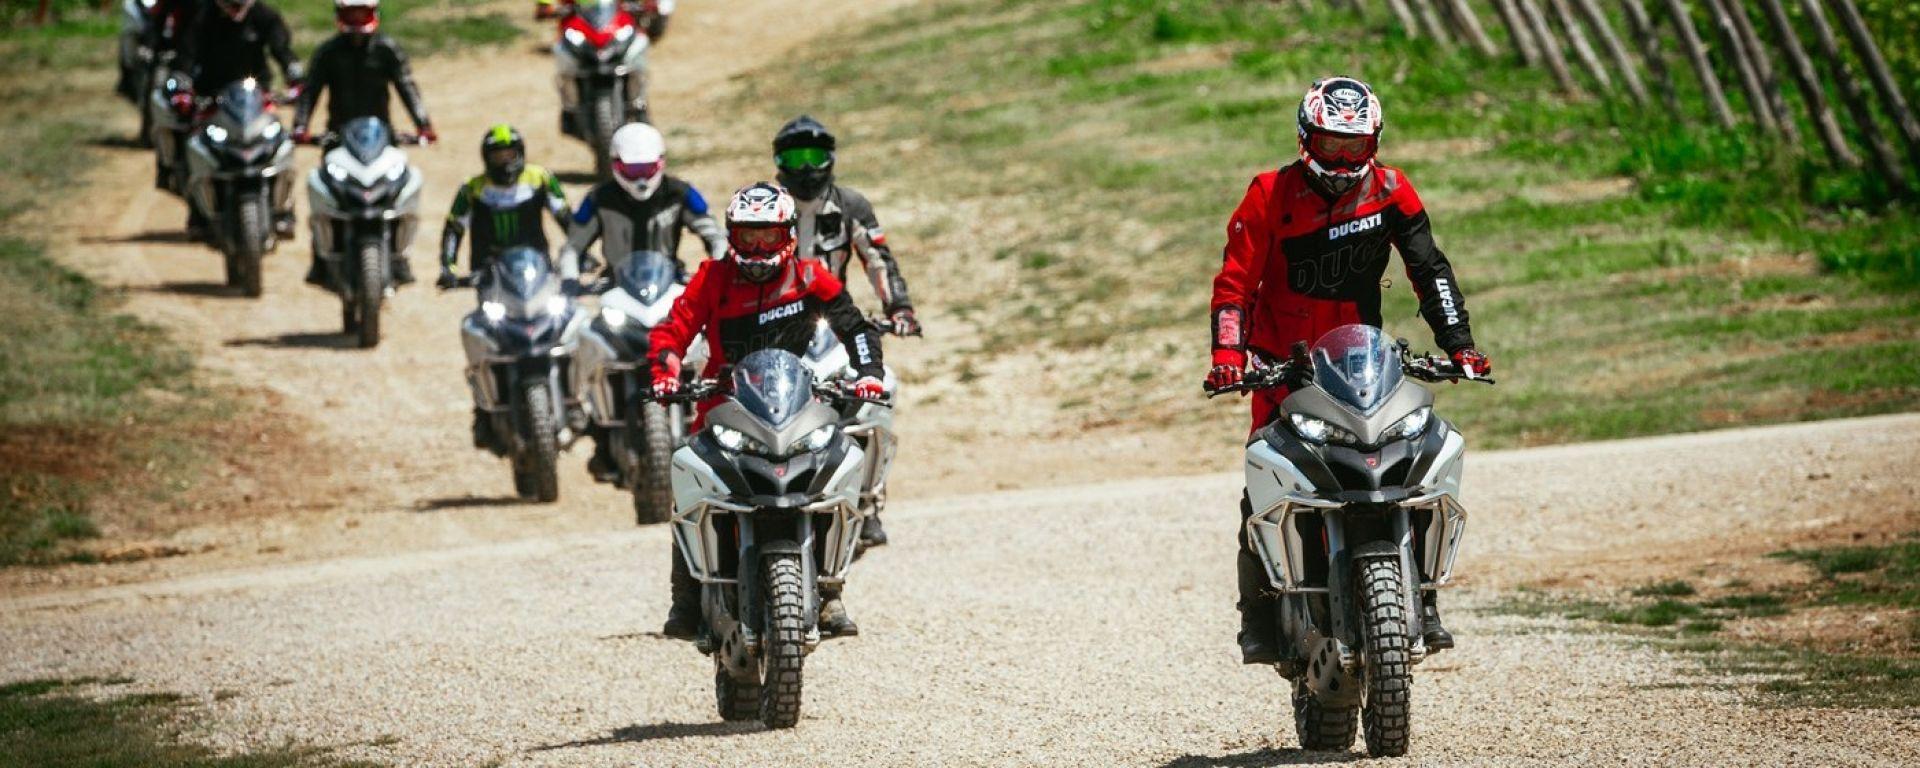 Ducati DRE Enduro 2017